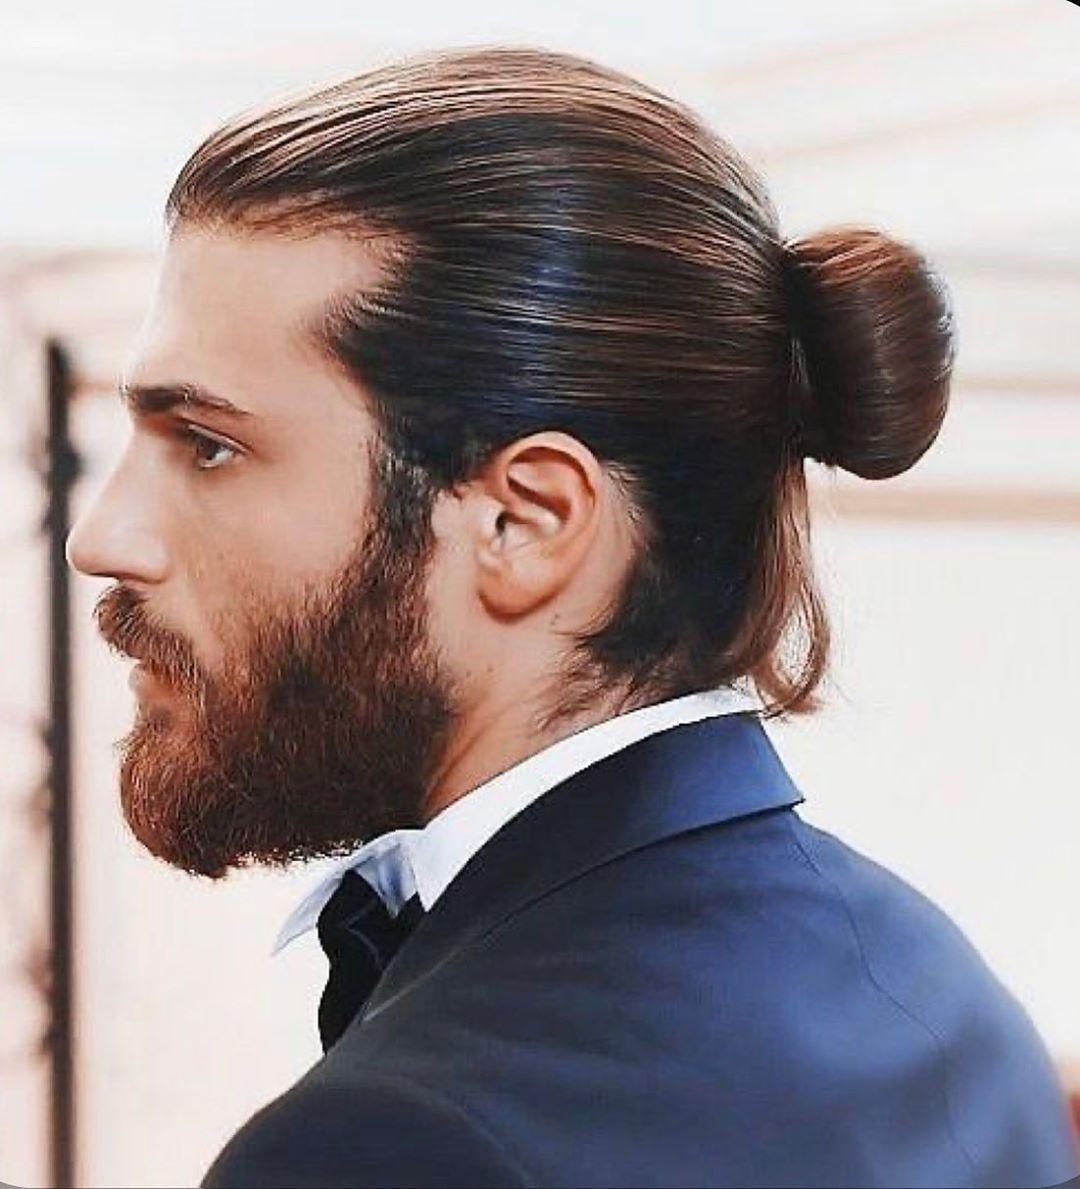 65 Man Bun Hairstyle Ideas Man Bun Hairstyles Man Bun Hairstyle